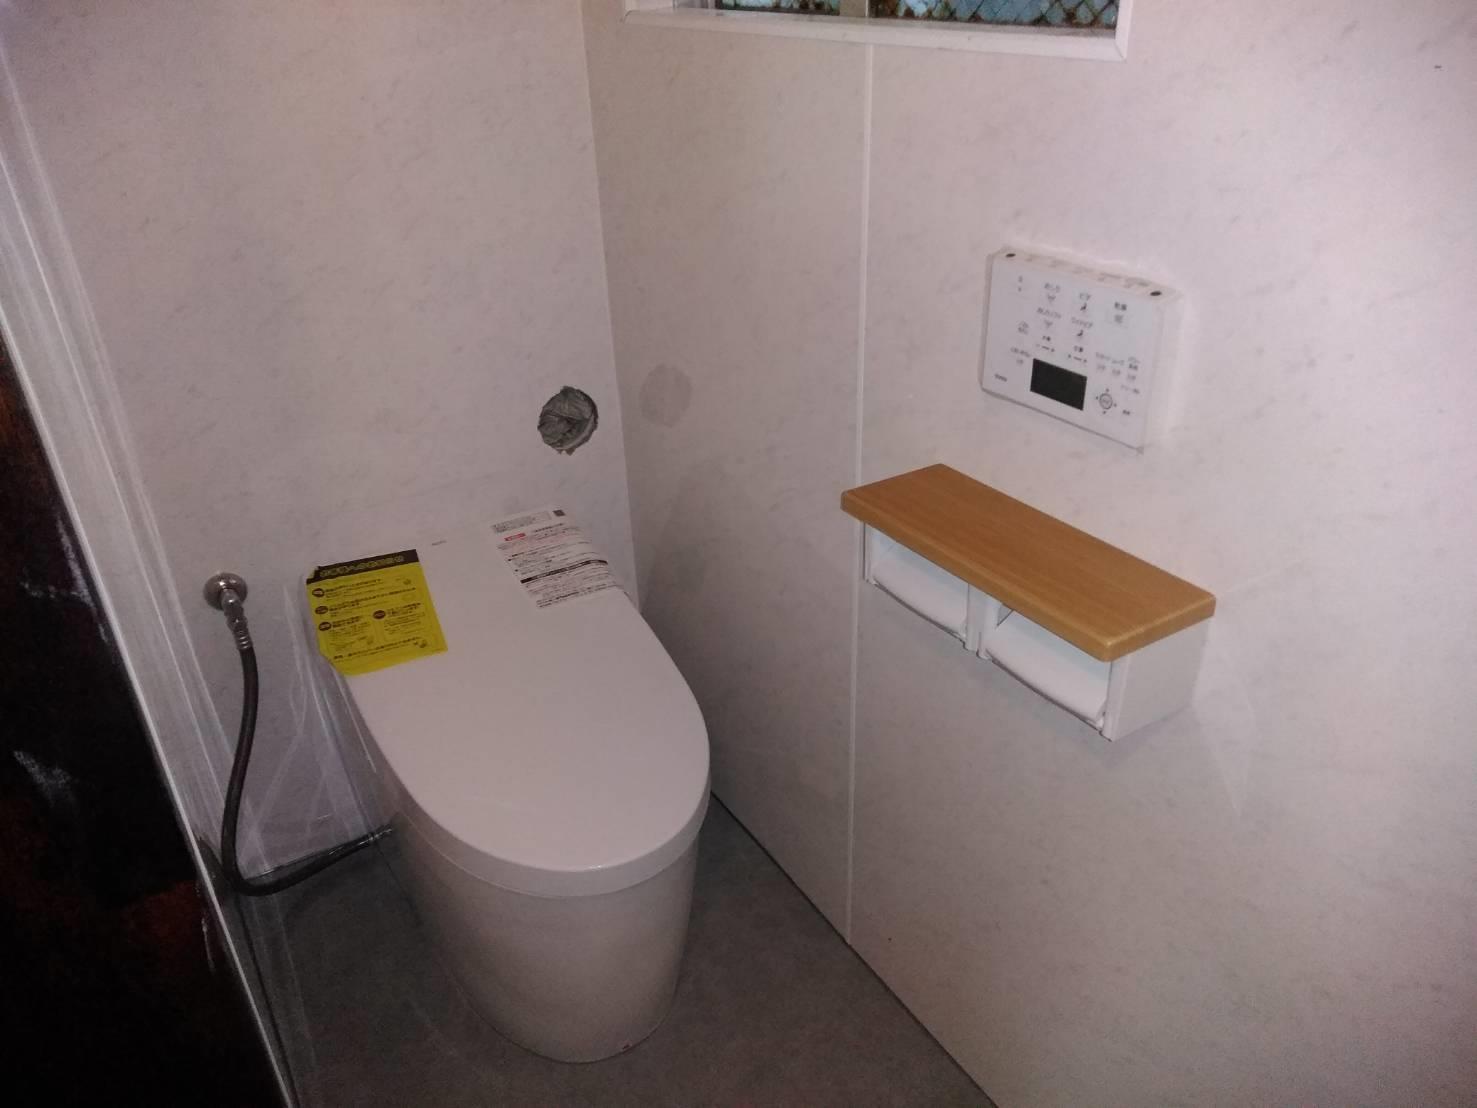 N邸1階内装工事(リフォーム施工事例)を公開しました。   沖縄や那覇でリフォームするなら【株式会社 あうん工房】